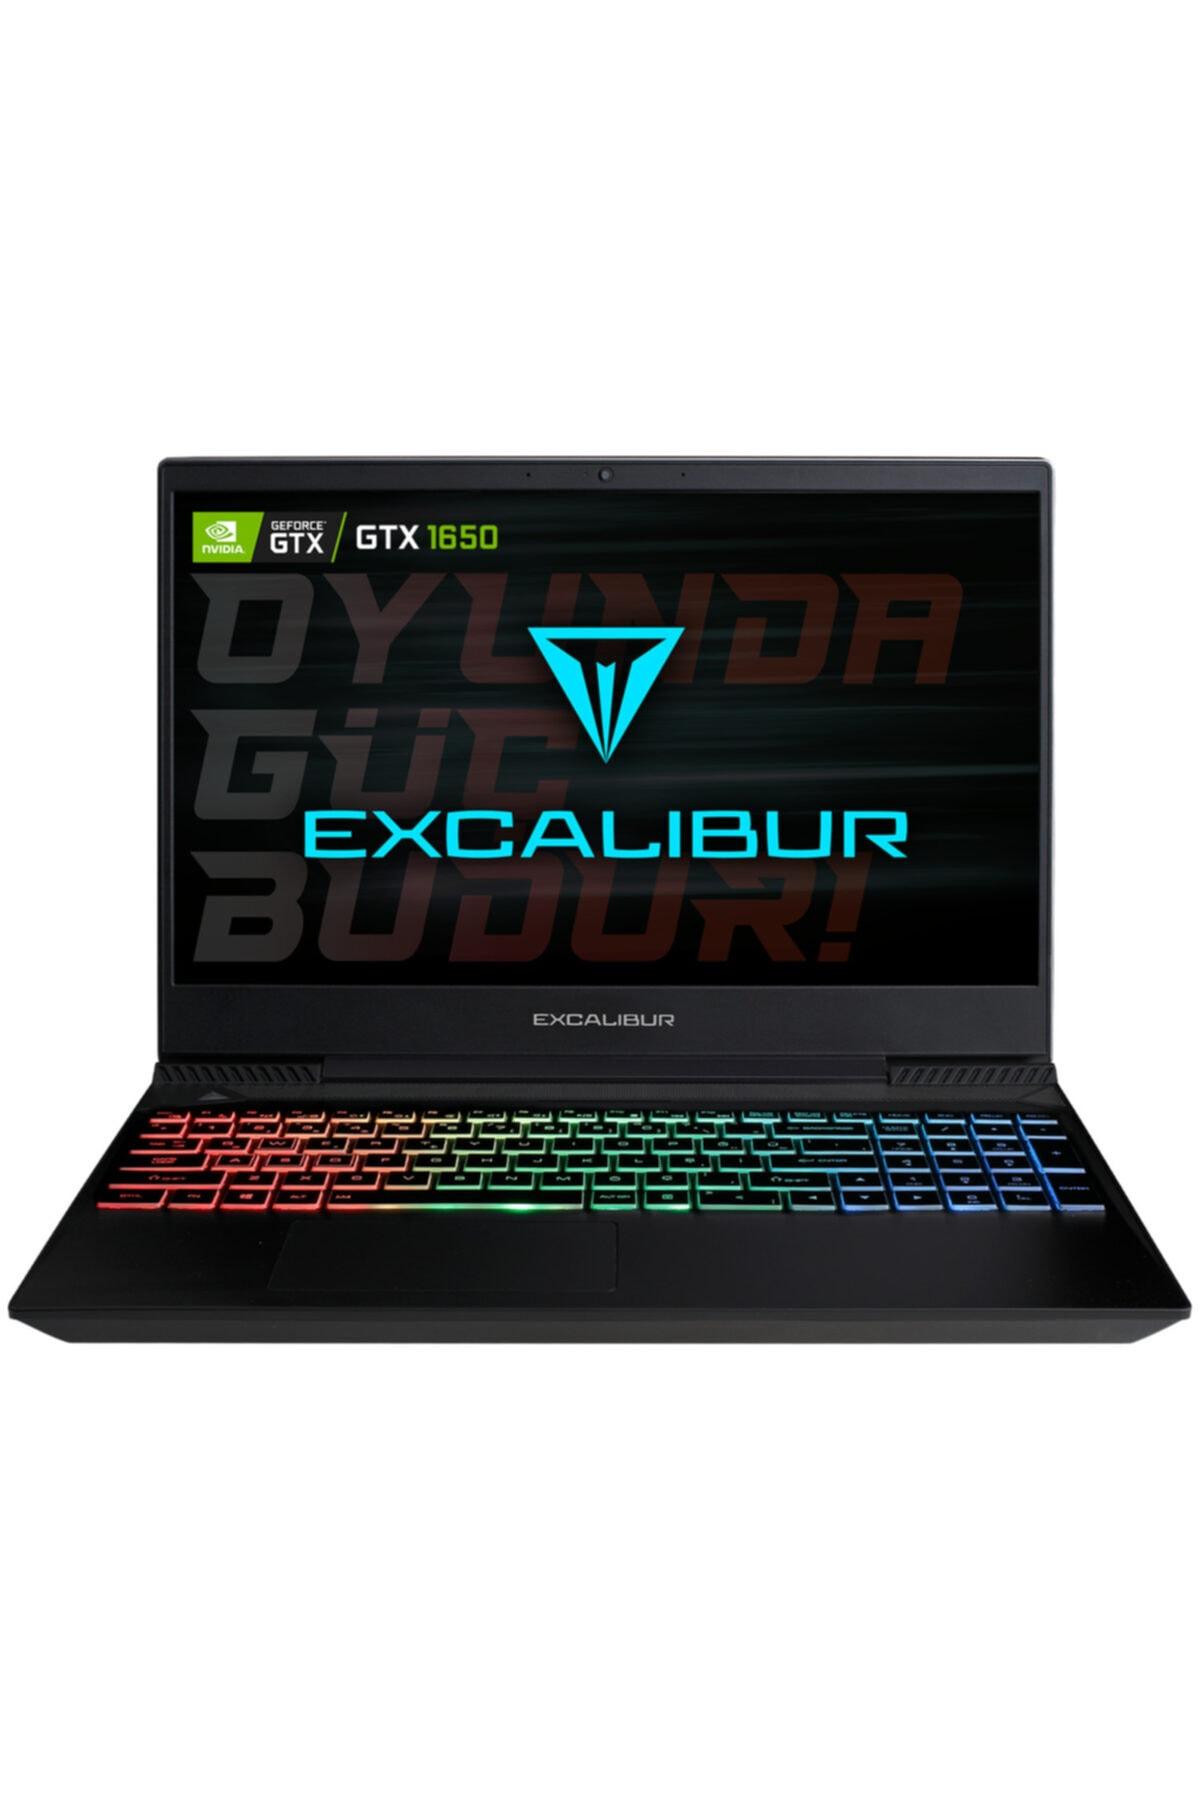 EXCALIBUR G770.9300-8UH0X İ5-9300H RGB 8GB 240GB M2 SSD GTX1650 4GB 15.6'' FREEDOS